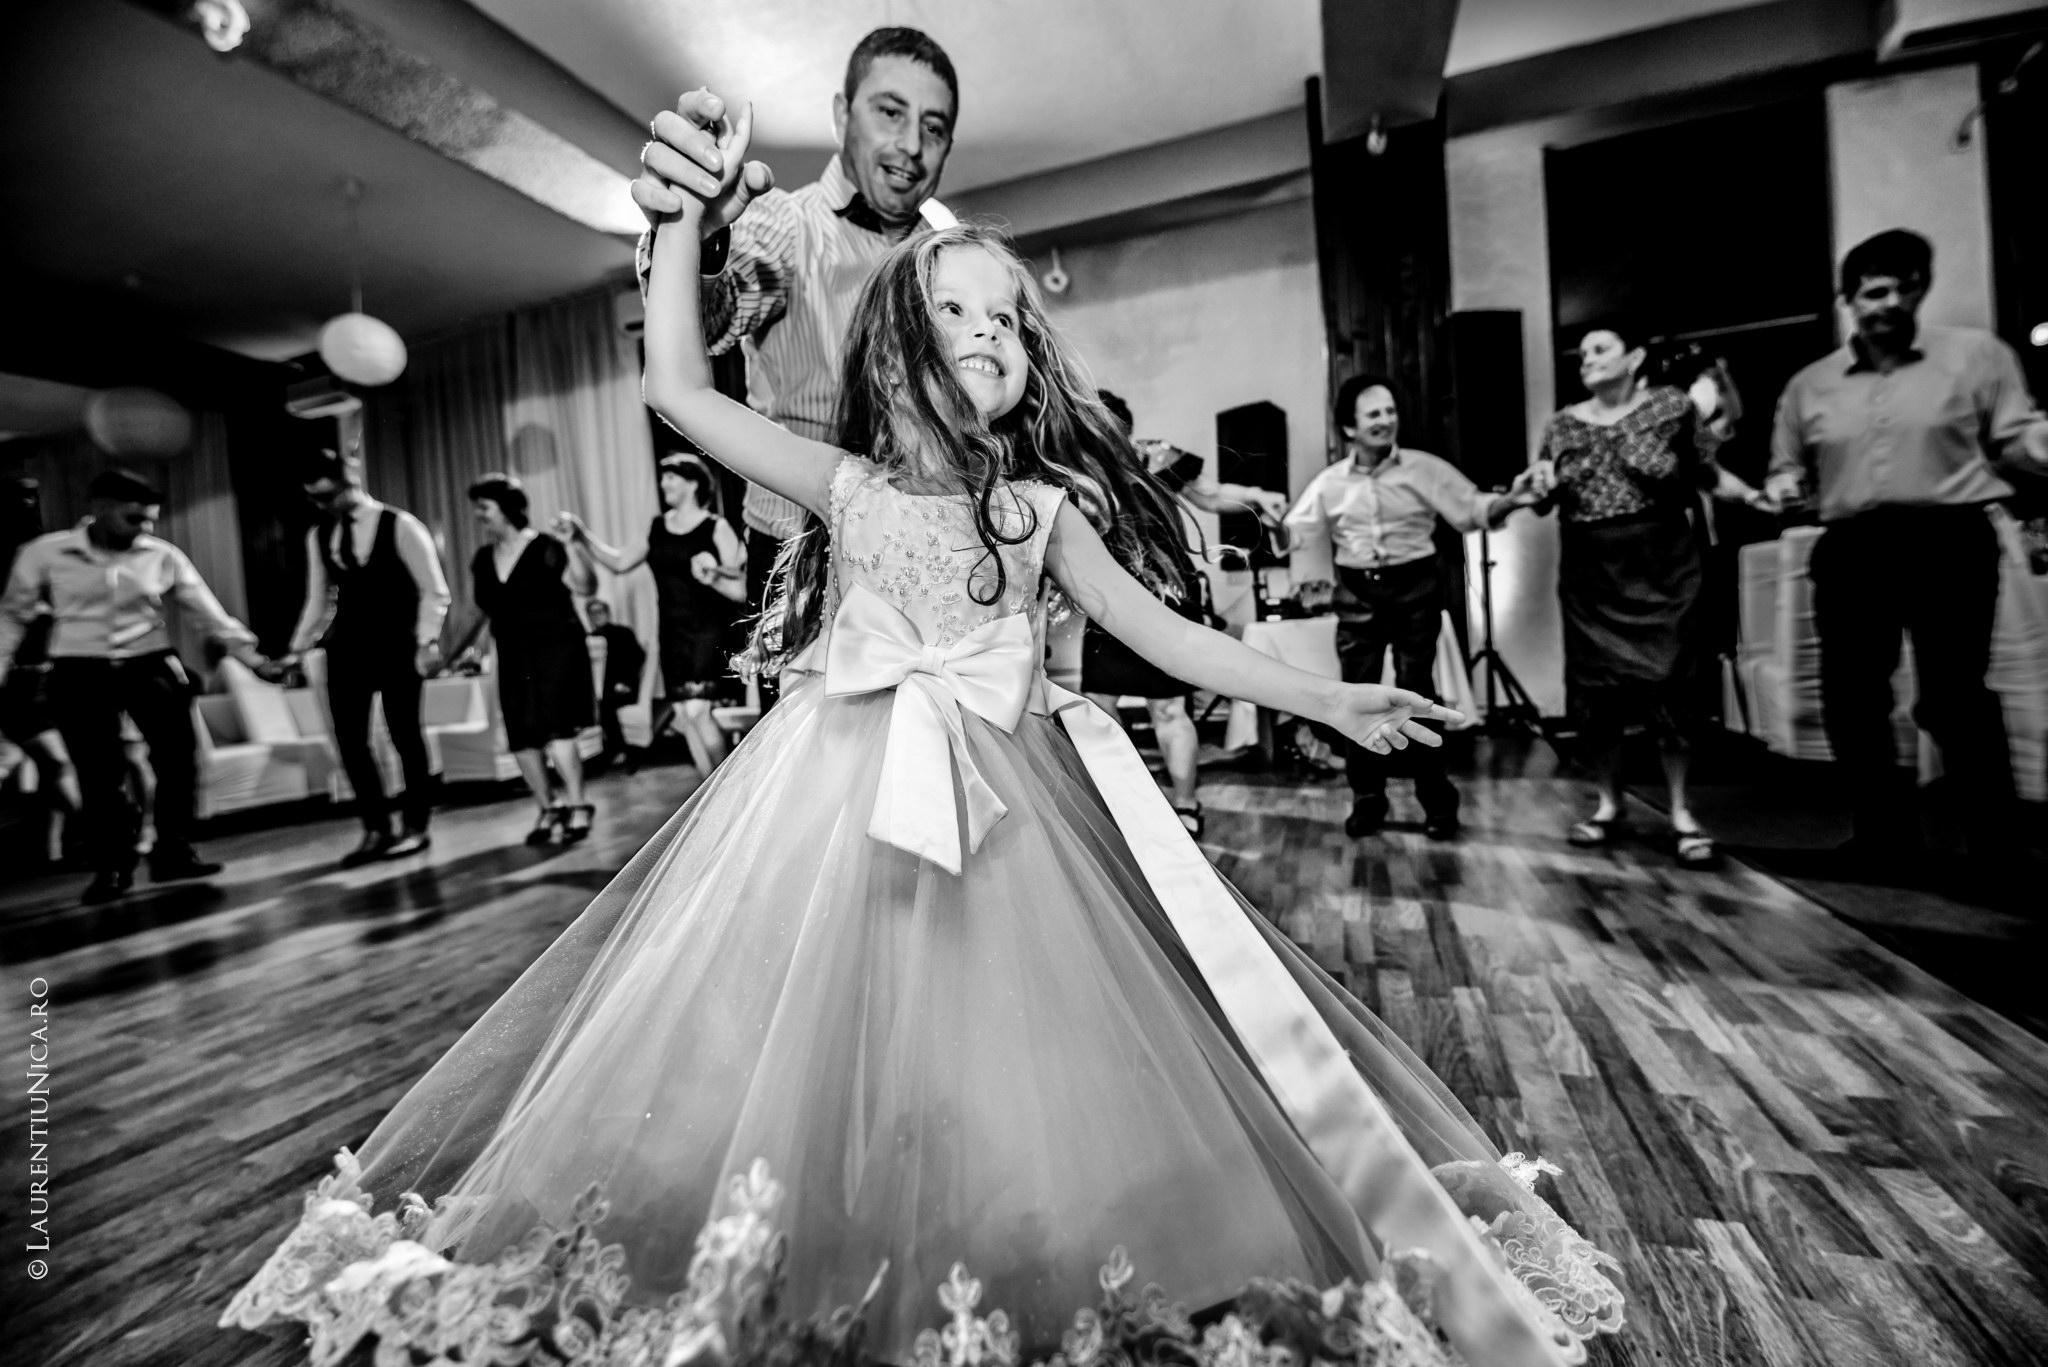 fotografii nunta Roxana si Cosmin fotograf nunta laurentiu nica 39 - Roxana & Cosmin | Fotografii nunta | Ticleni, judetul Gorj